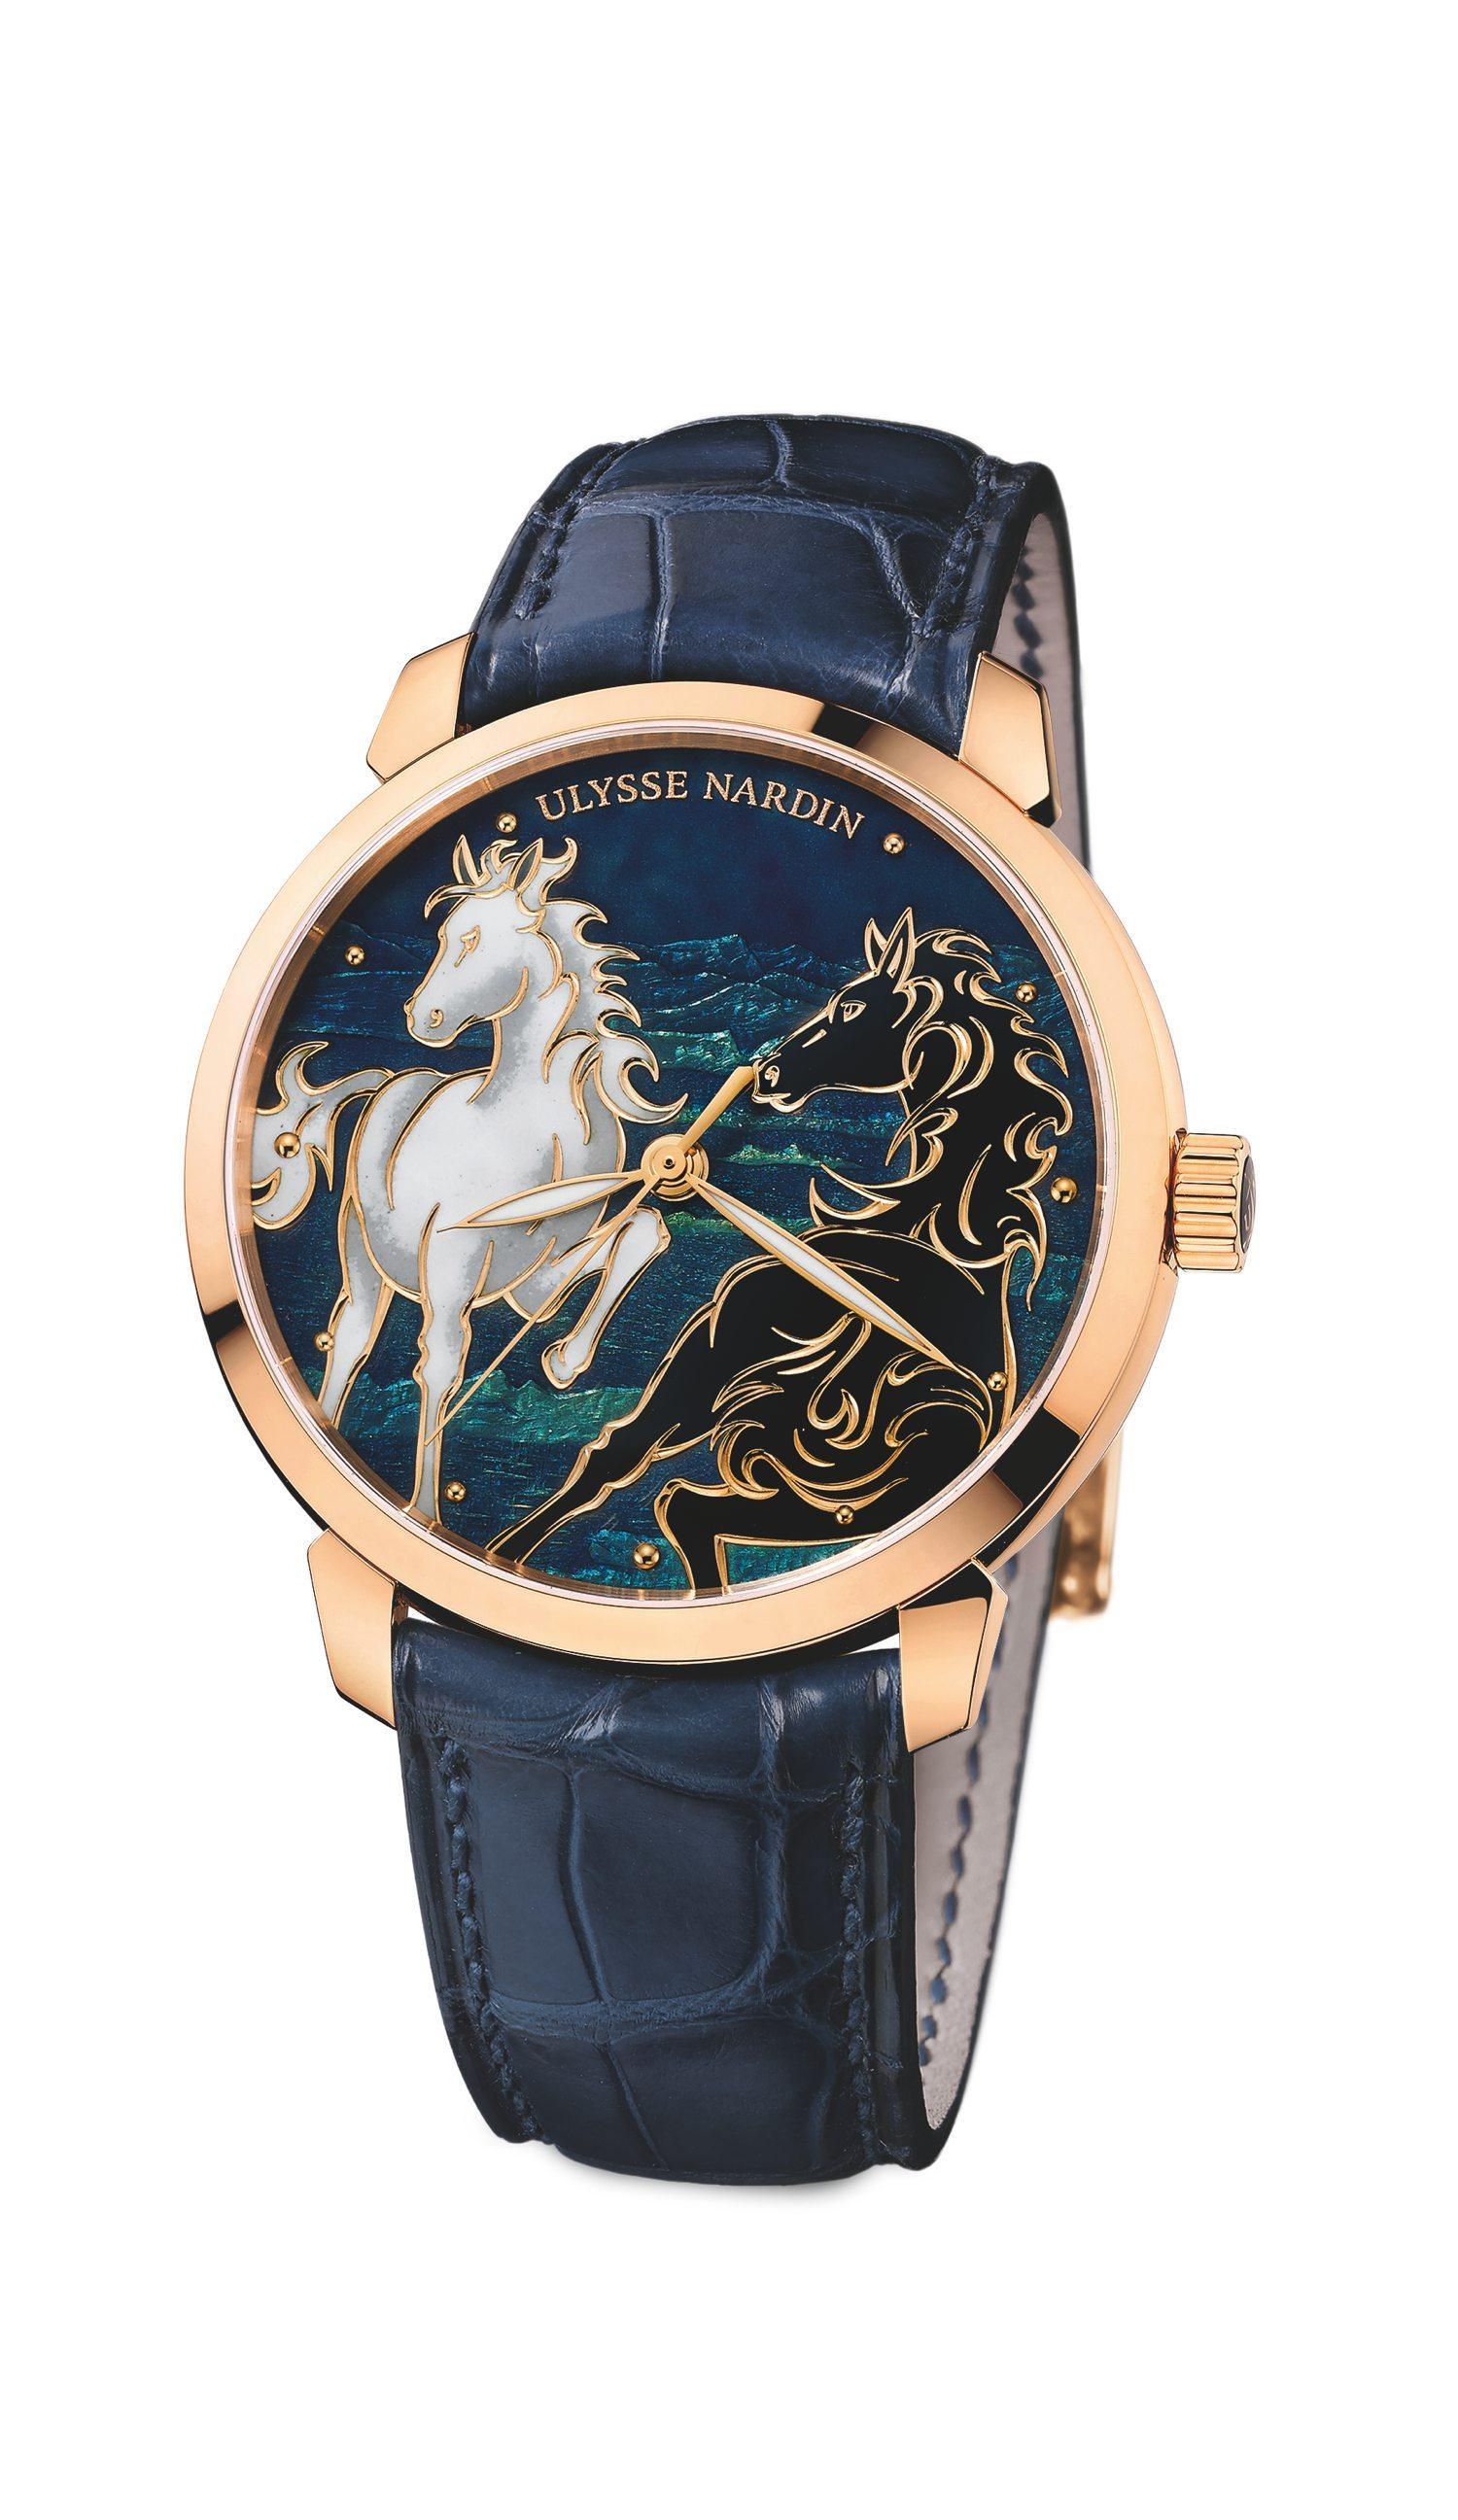 1339b9367a Novità Orologi 2014 Ulysse Nardin Classico Horse